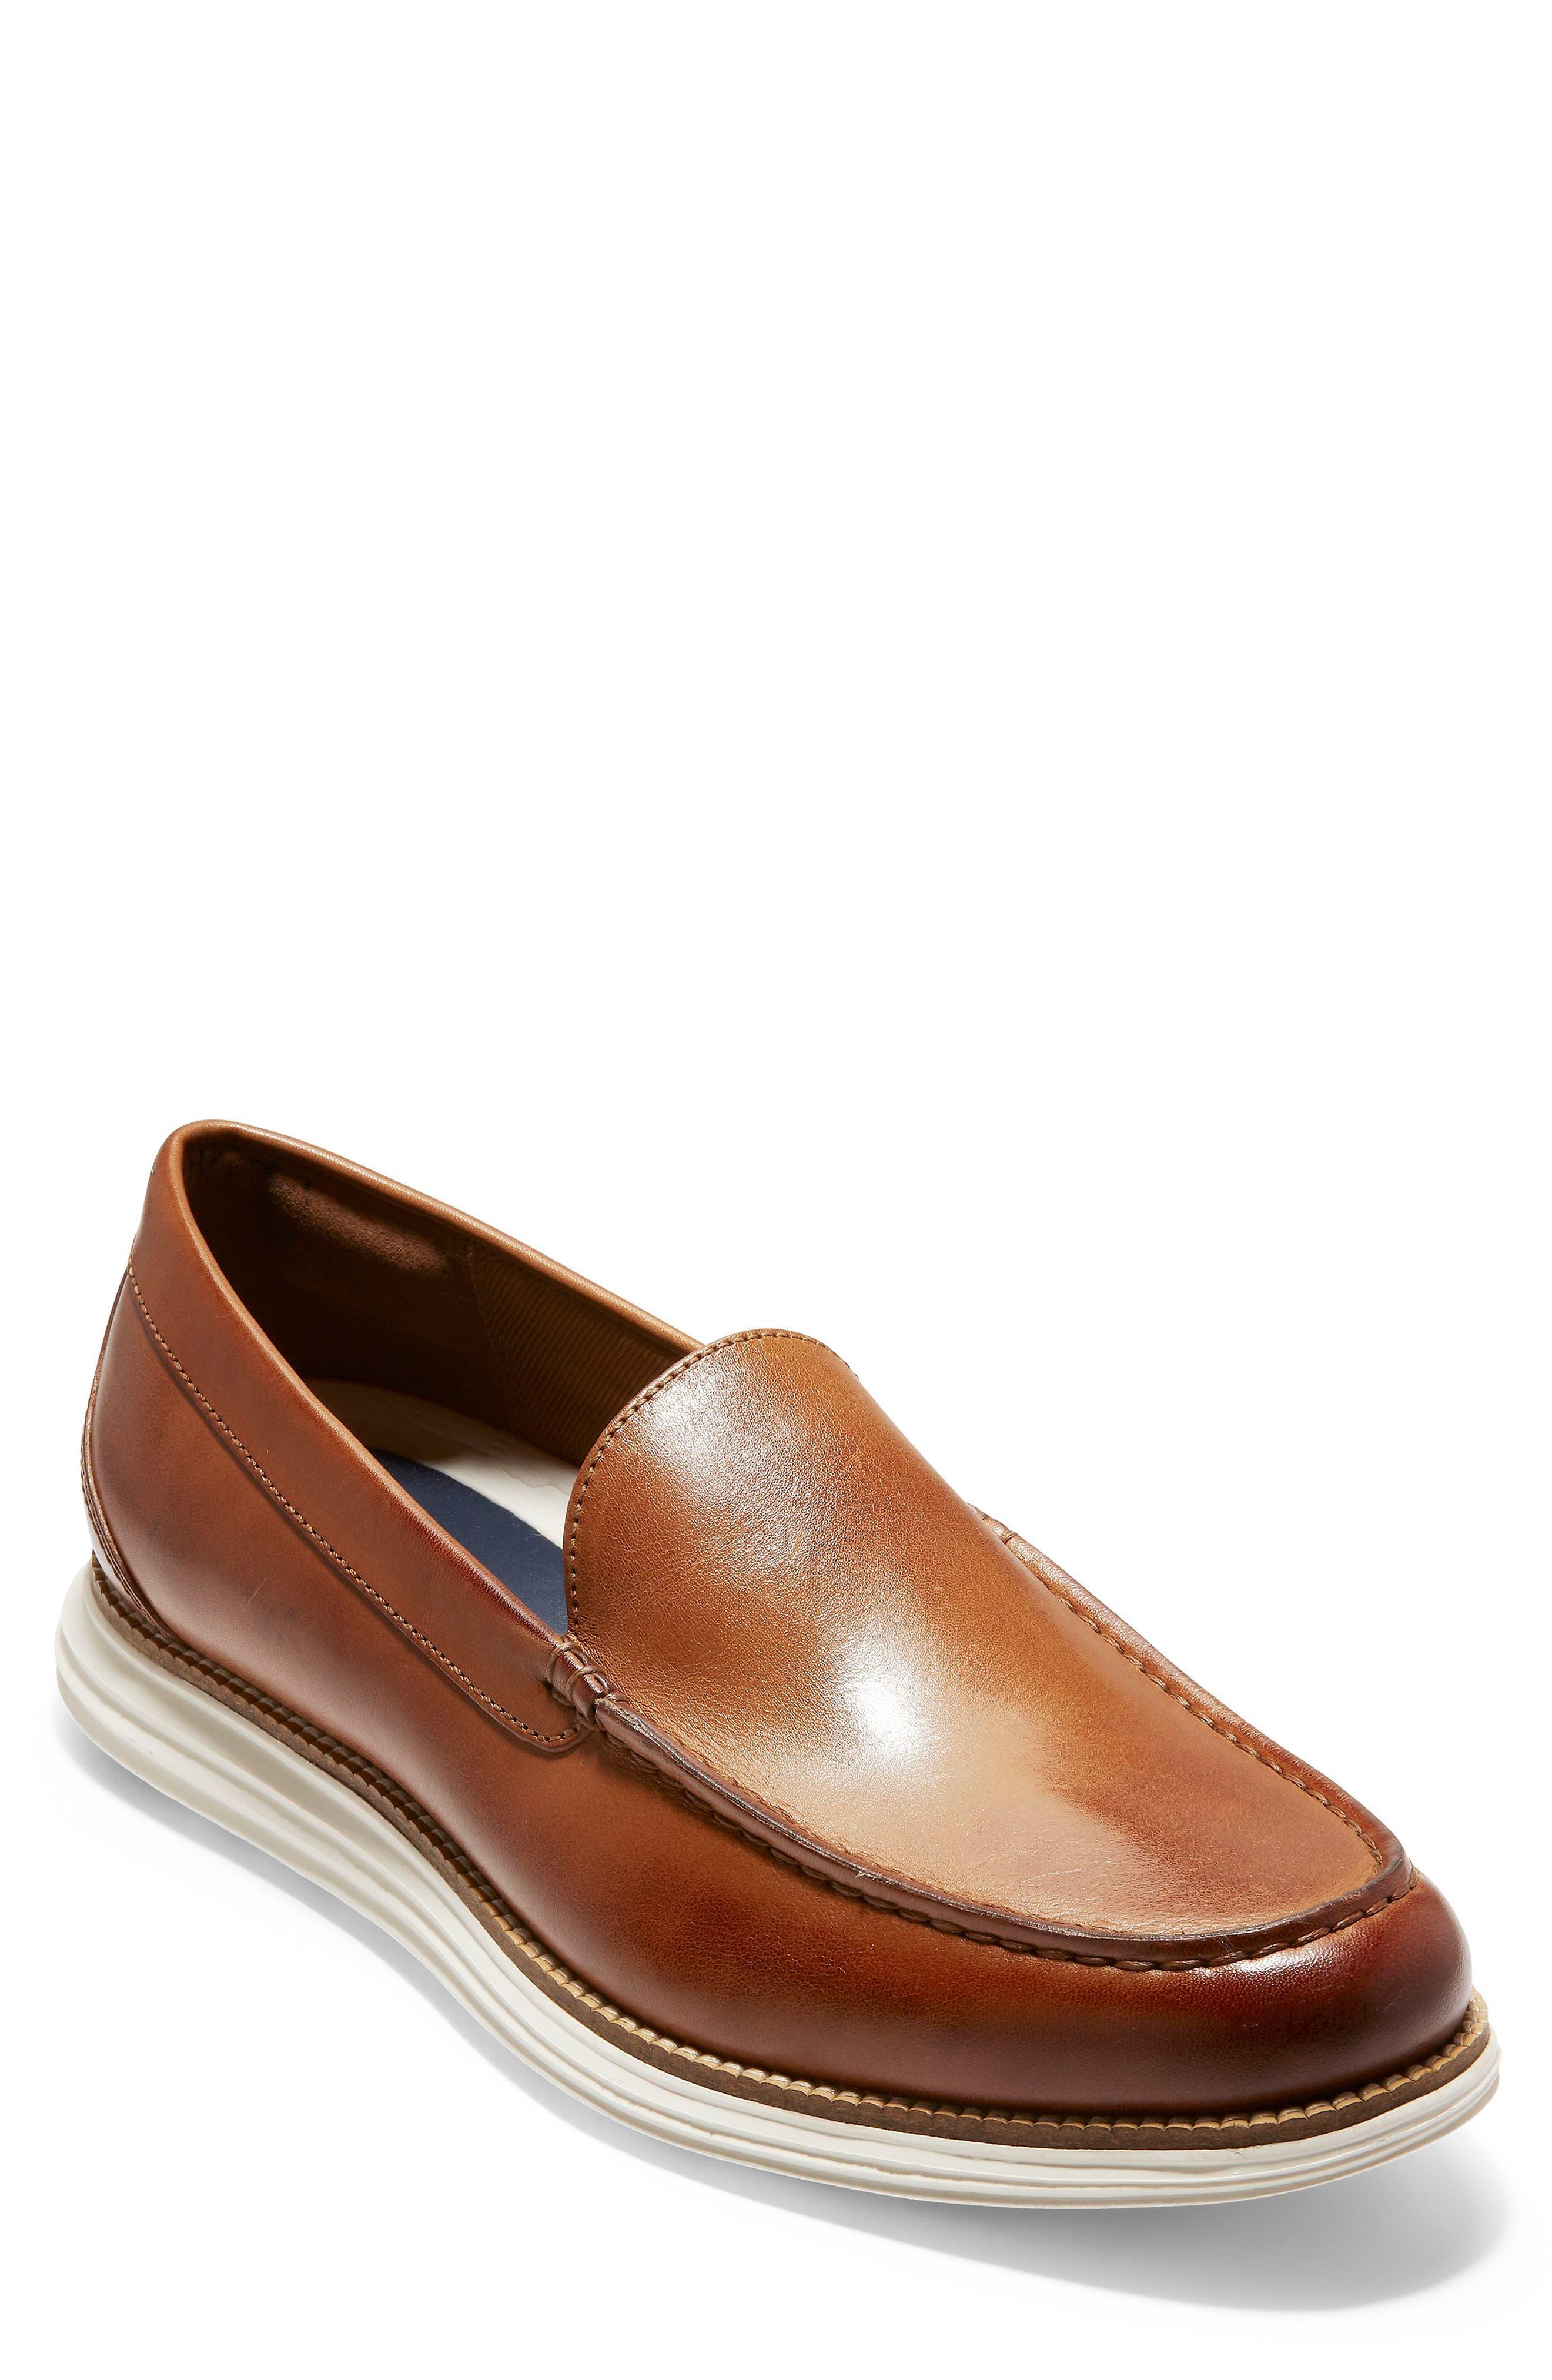 Cole Haan Original Grand Loafer, Brown